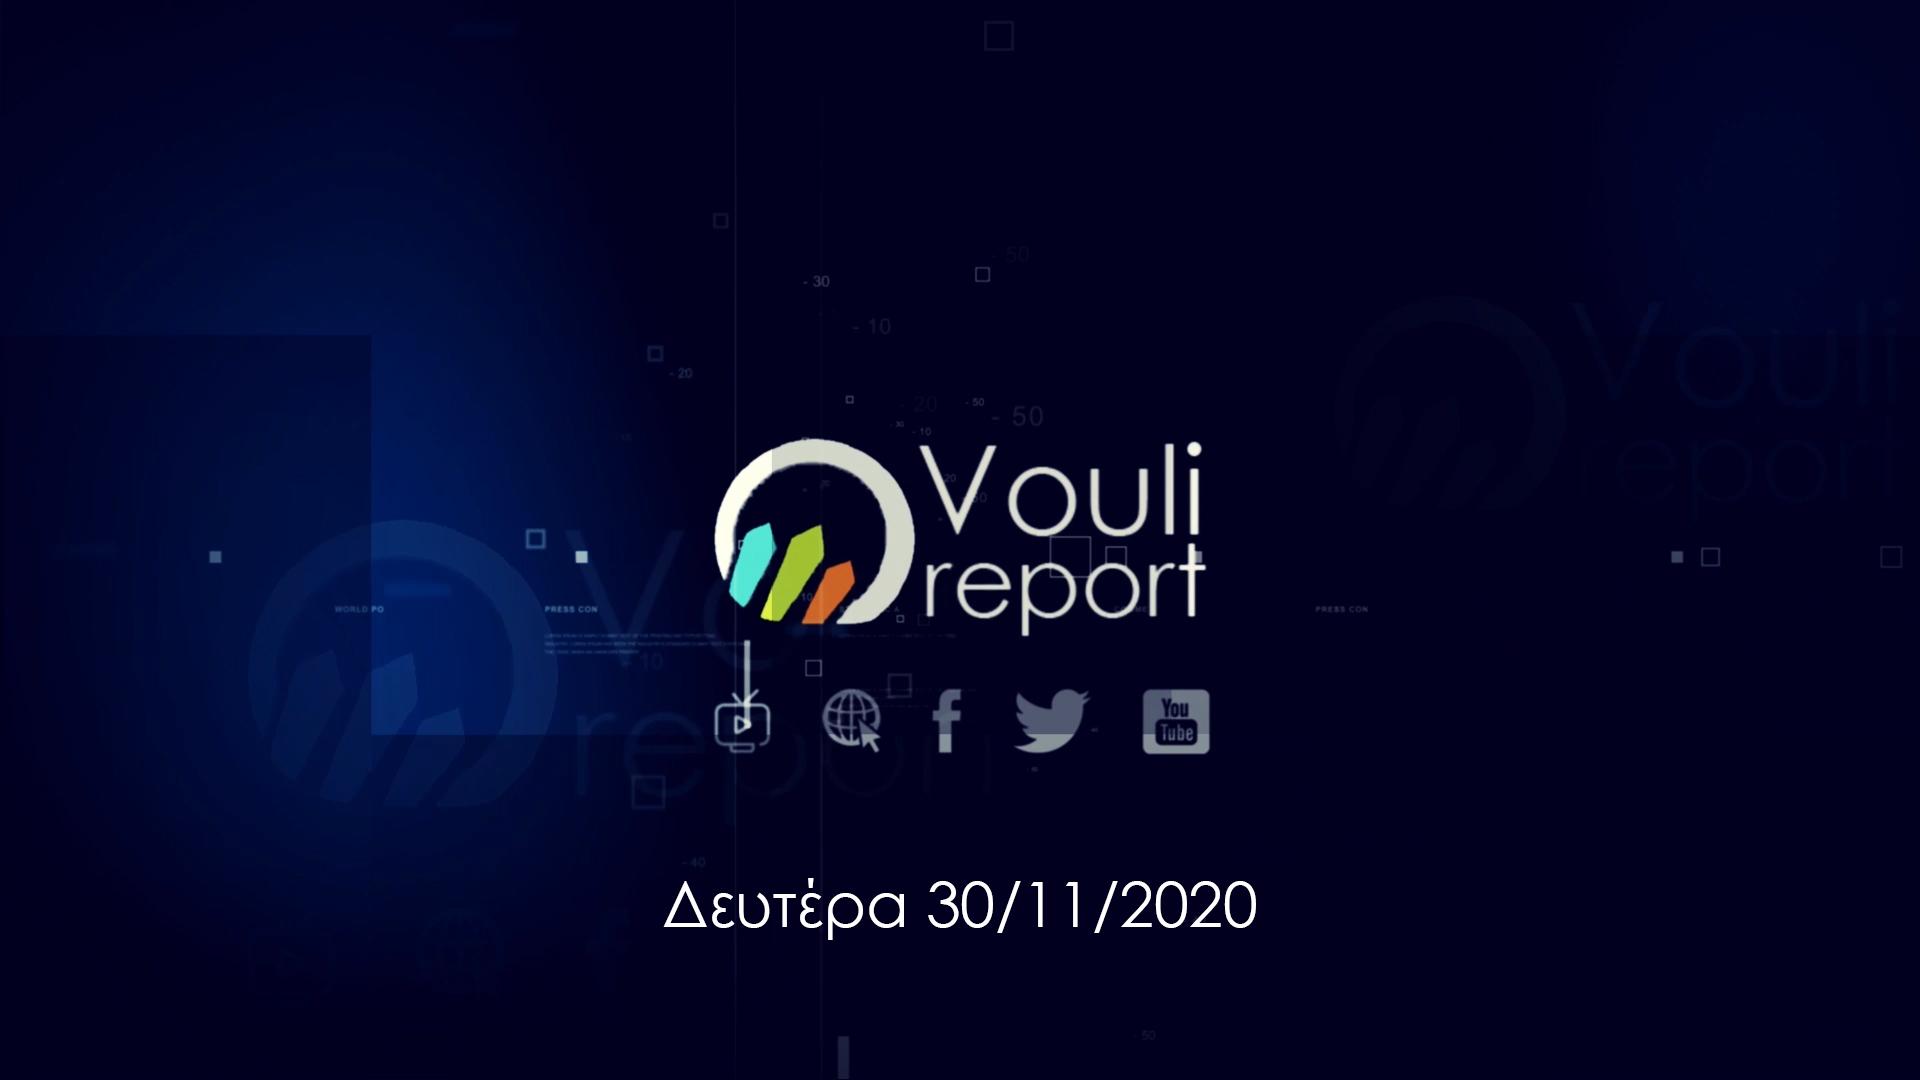 Vouli report | 30/11/2020